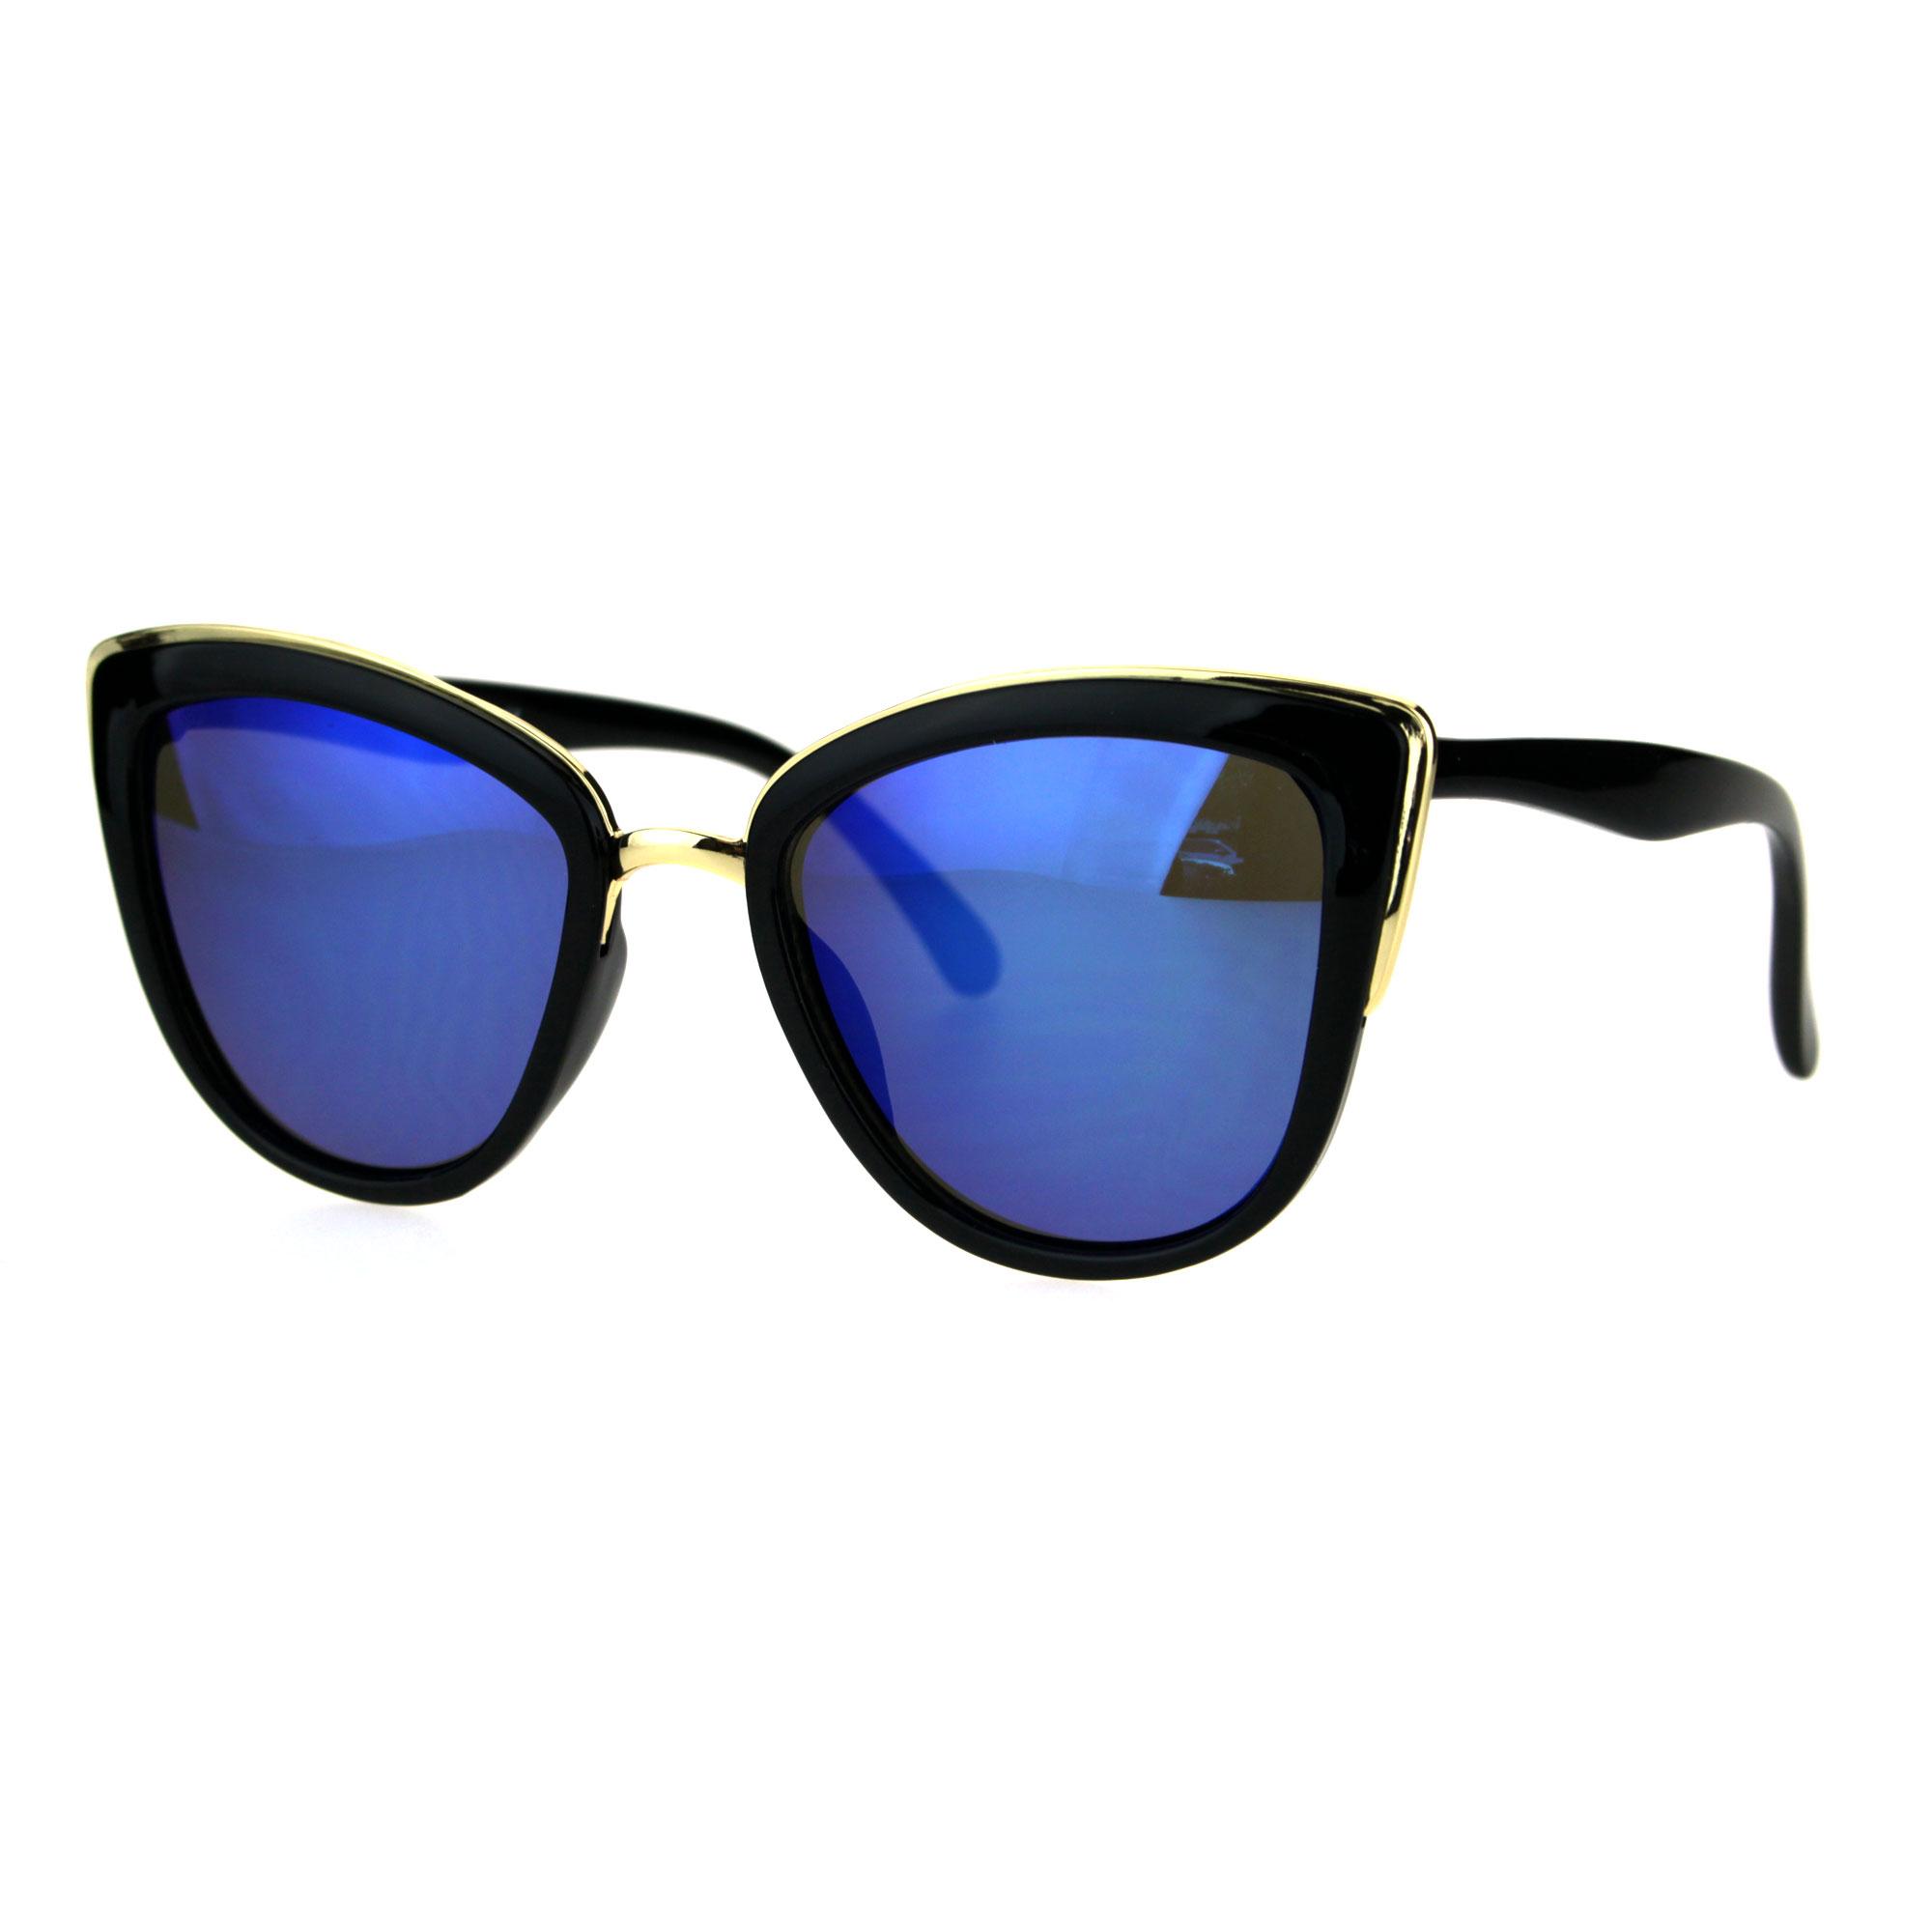 Womens Gothic Retro Oversize Cat Eye Fashion Sunglasses